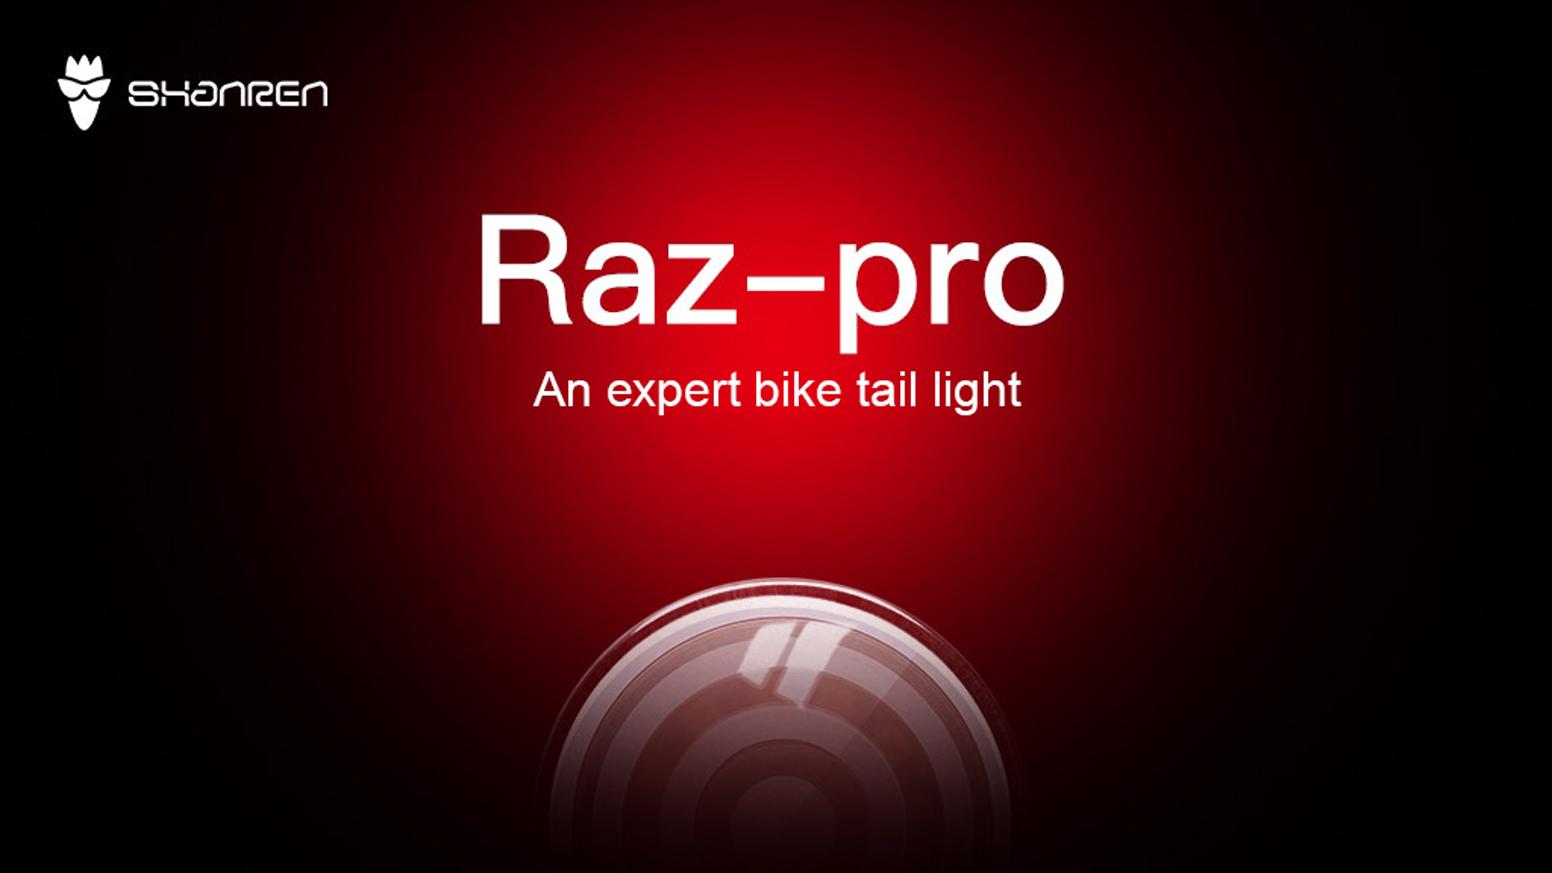 Raz: مصباح الدراجة الذكي